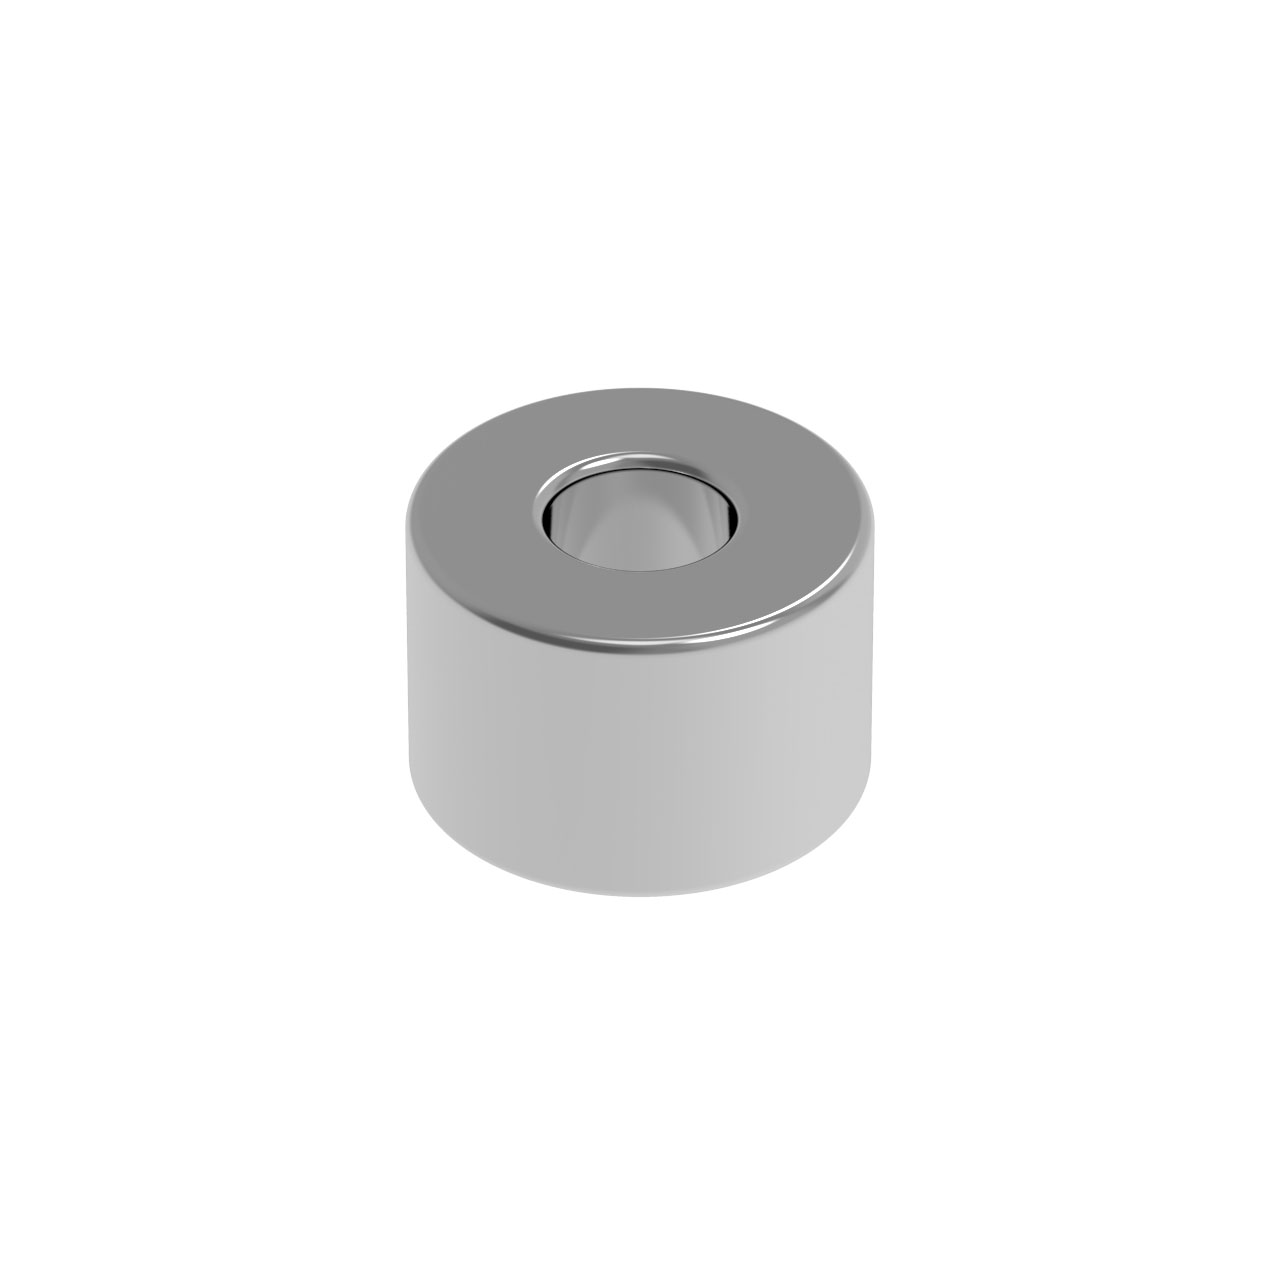 HIQPARTS(ハイキューパーツ) ネオジム磁石 N52 軸穴付丸形 直径3mm x 高さ2mm(8個入) [MGN3020H] 4582370708558